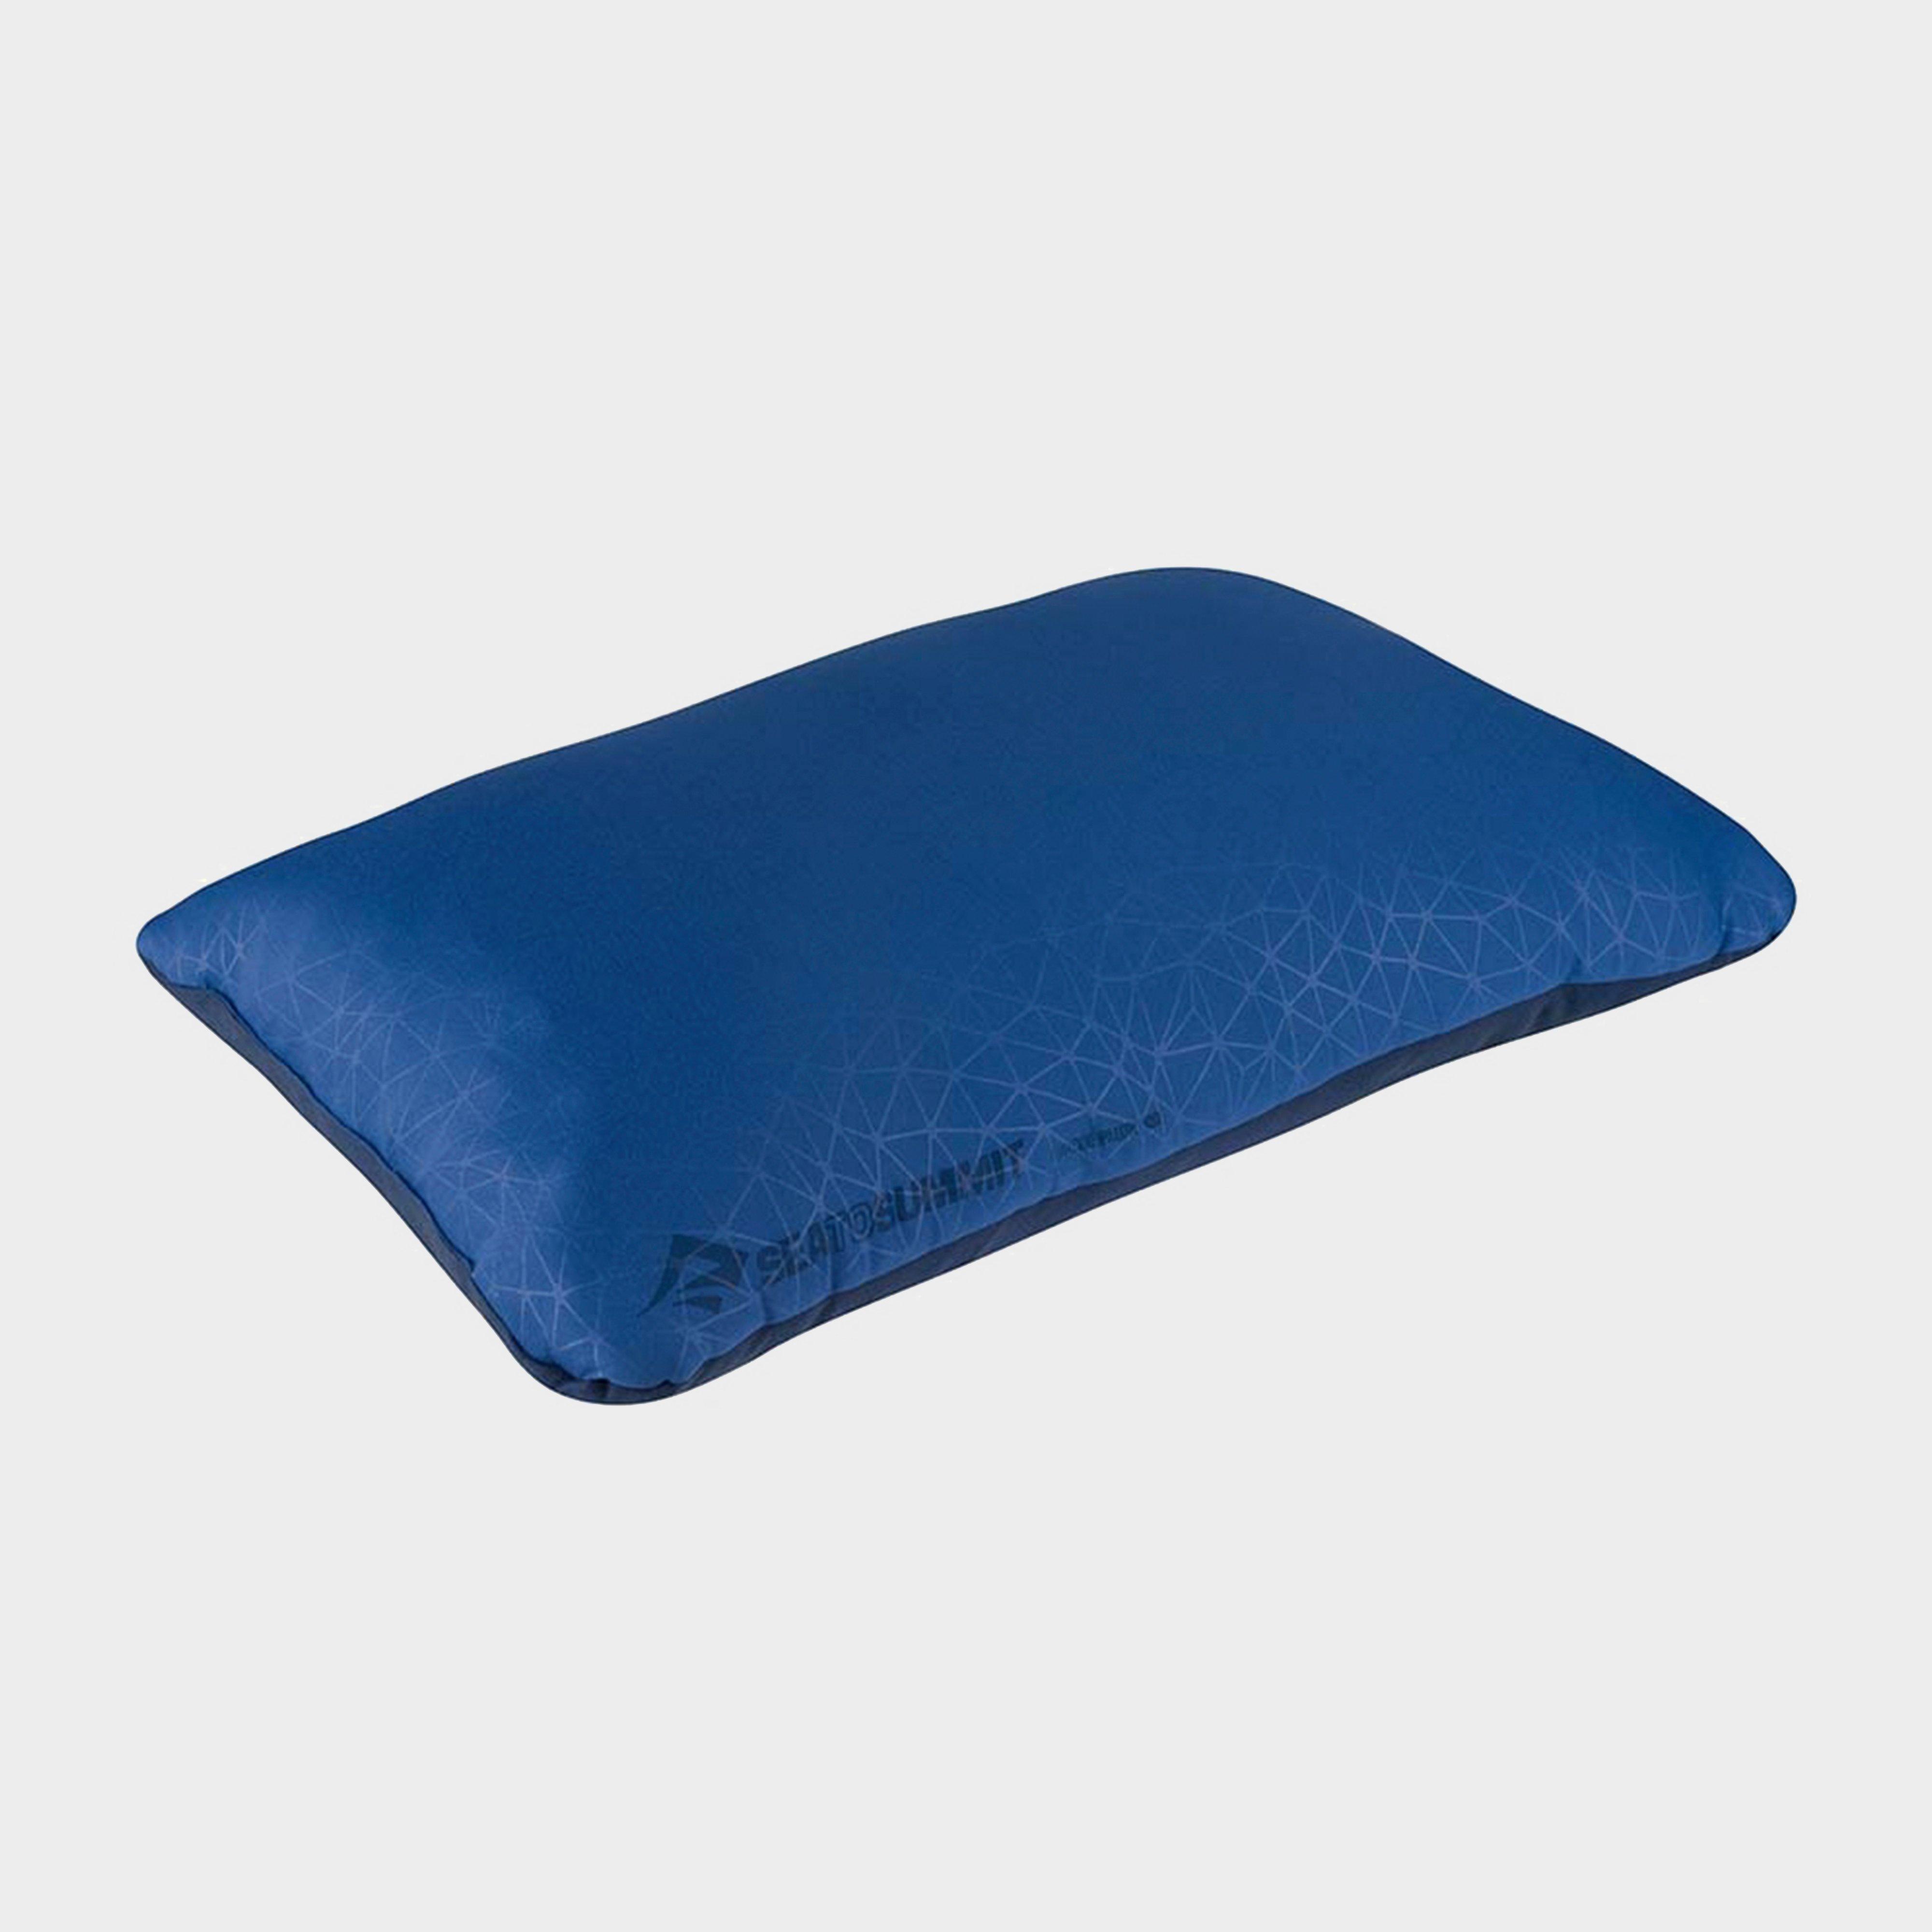 Sea To Summit Foamcore Pillow - Blue/reg  Blue/reg